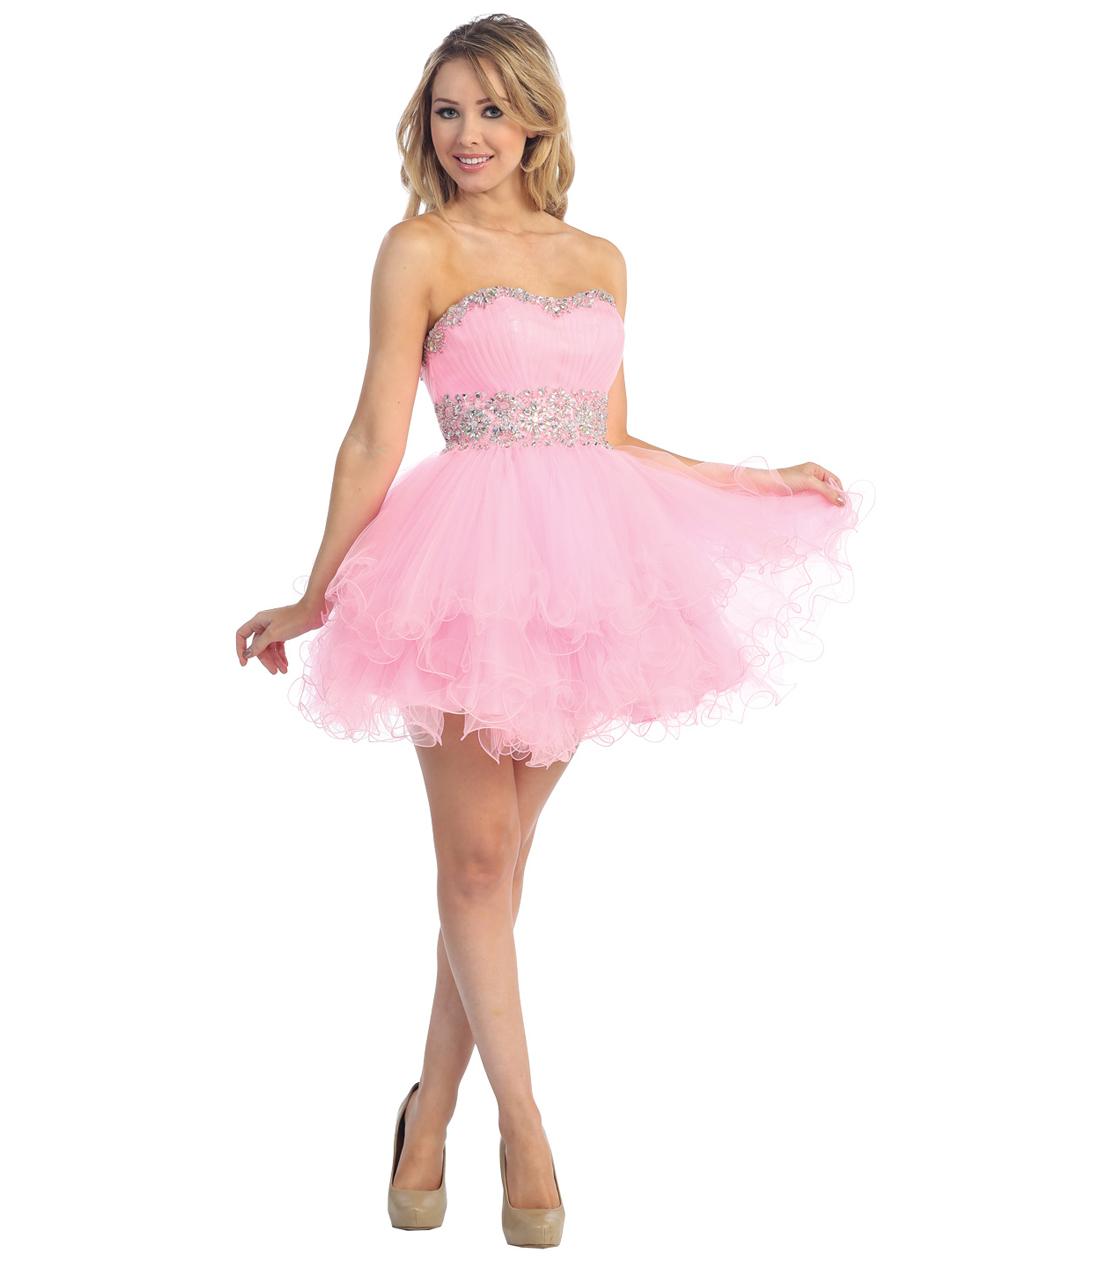 9f37a727dc2 2013 Prom Dresses - Pink Chiffon Strapless Short Prom Dress ...